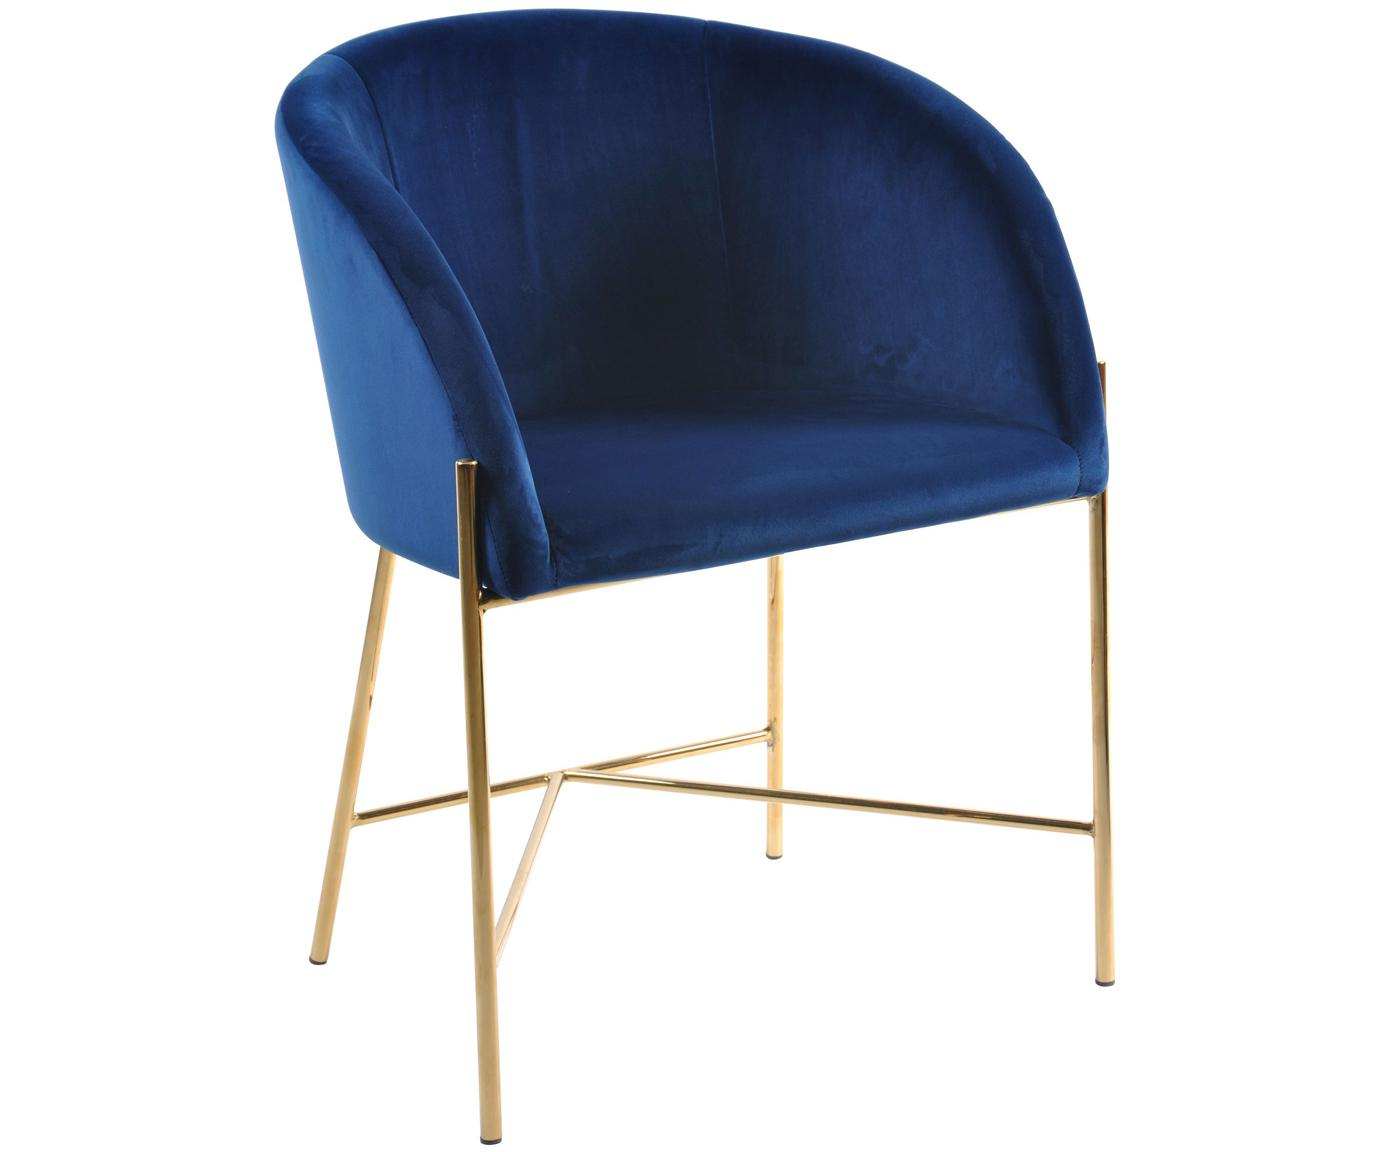 Samt-Polsterstuhl Nelson in modernem Design, Bezug: Polyestersamt 25.000 Sche, Beine: Metall, vermessingt, Dunkelblau, Messingfarben, B 56 x T 55 cm